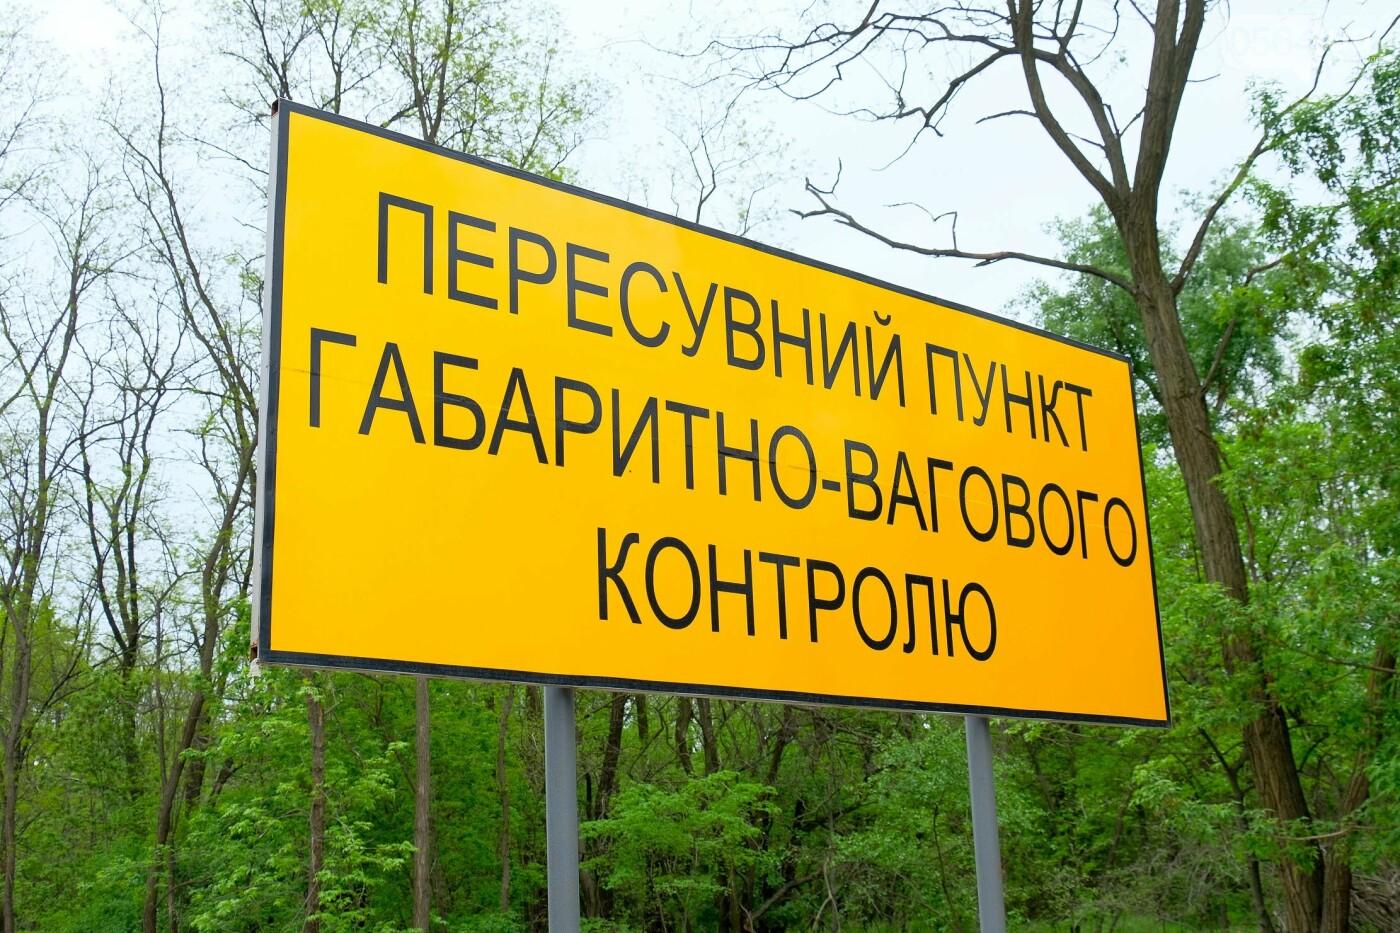 На въездах в Днепр в течение двух месяцев выявили почти 200 фур с перегрузом, - ФОТО, фото-1